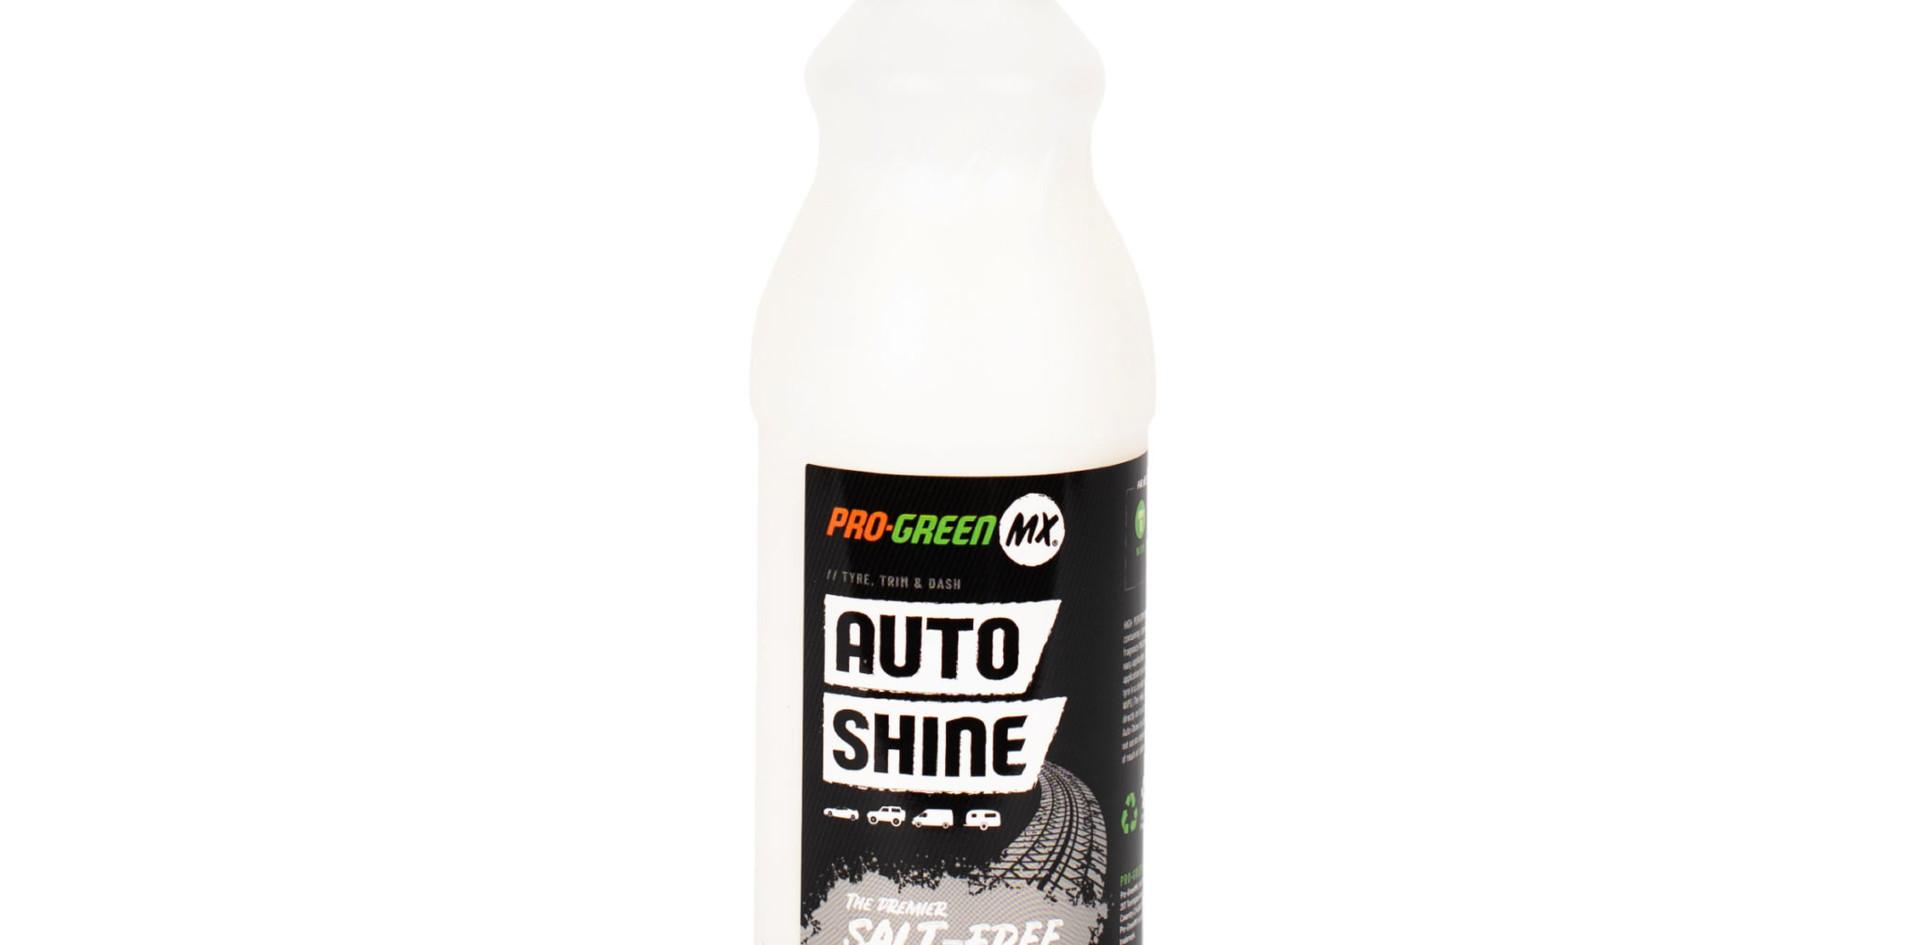 PRO GREEN MX AUTO SHINE